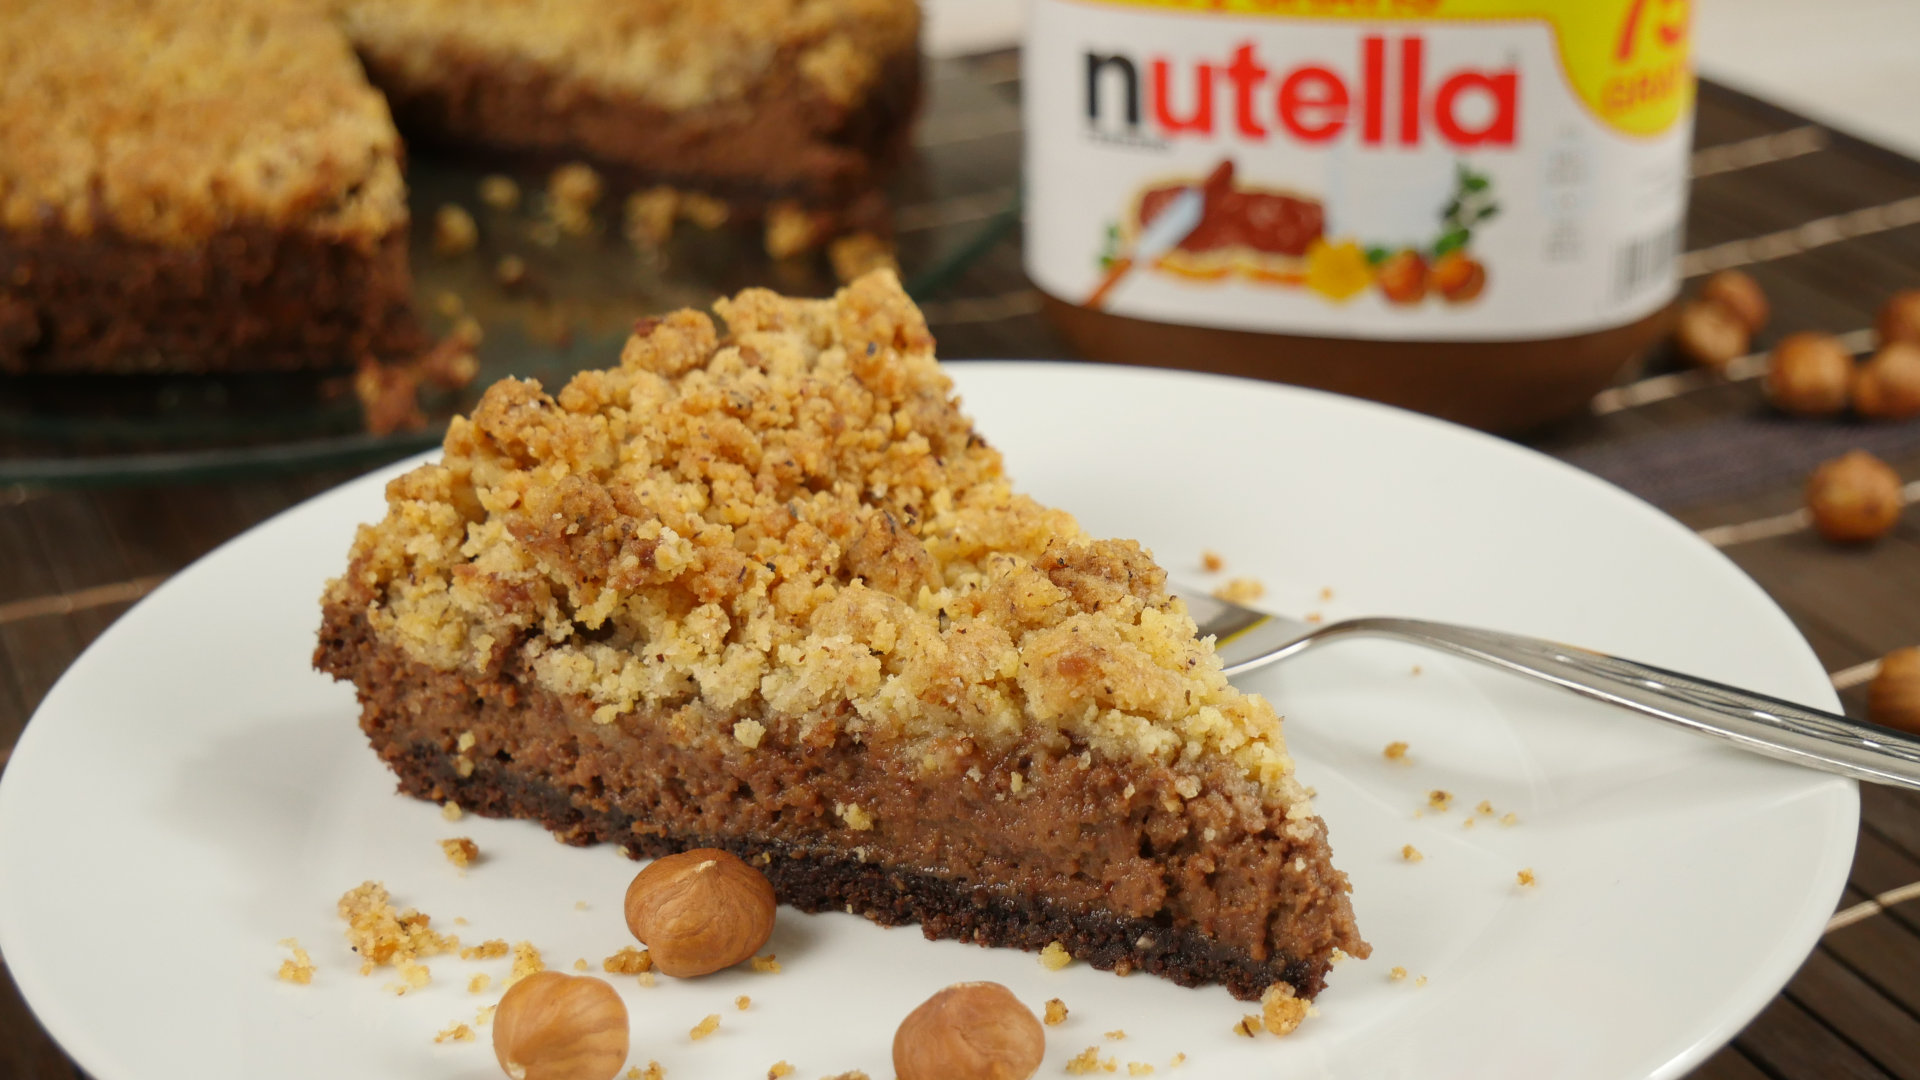 Rezept Nutella Streuselkuchen